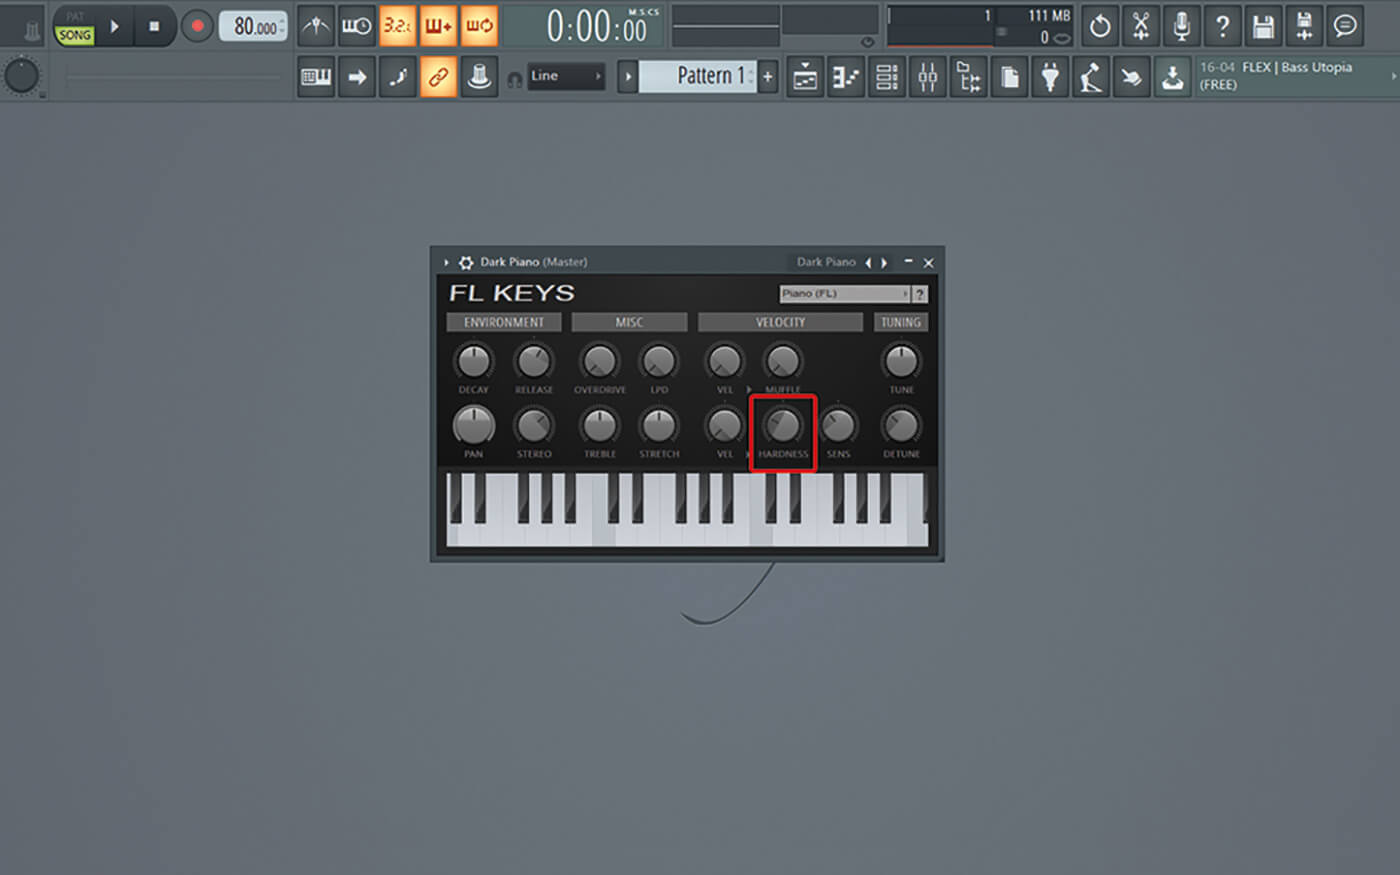 MT208 FLT Studio Lo-Fi Beats TUT 2